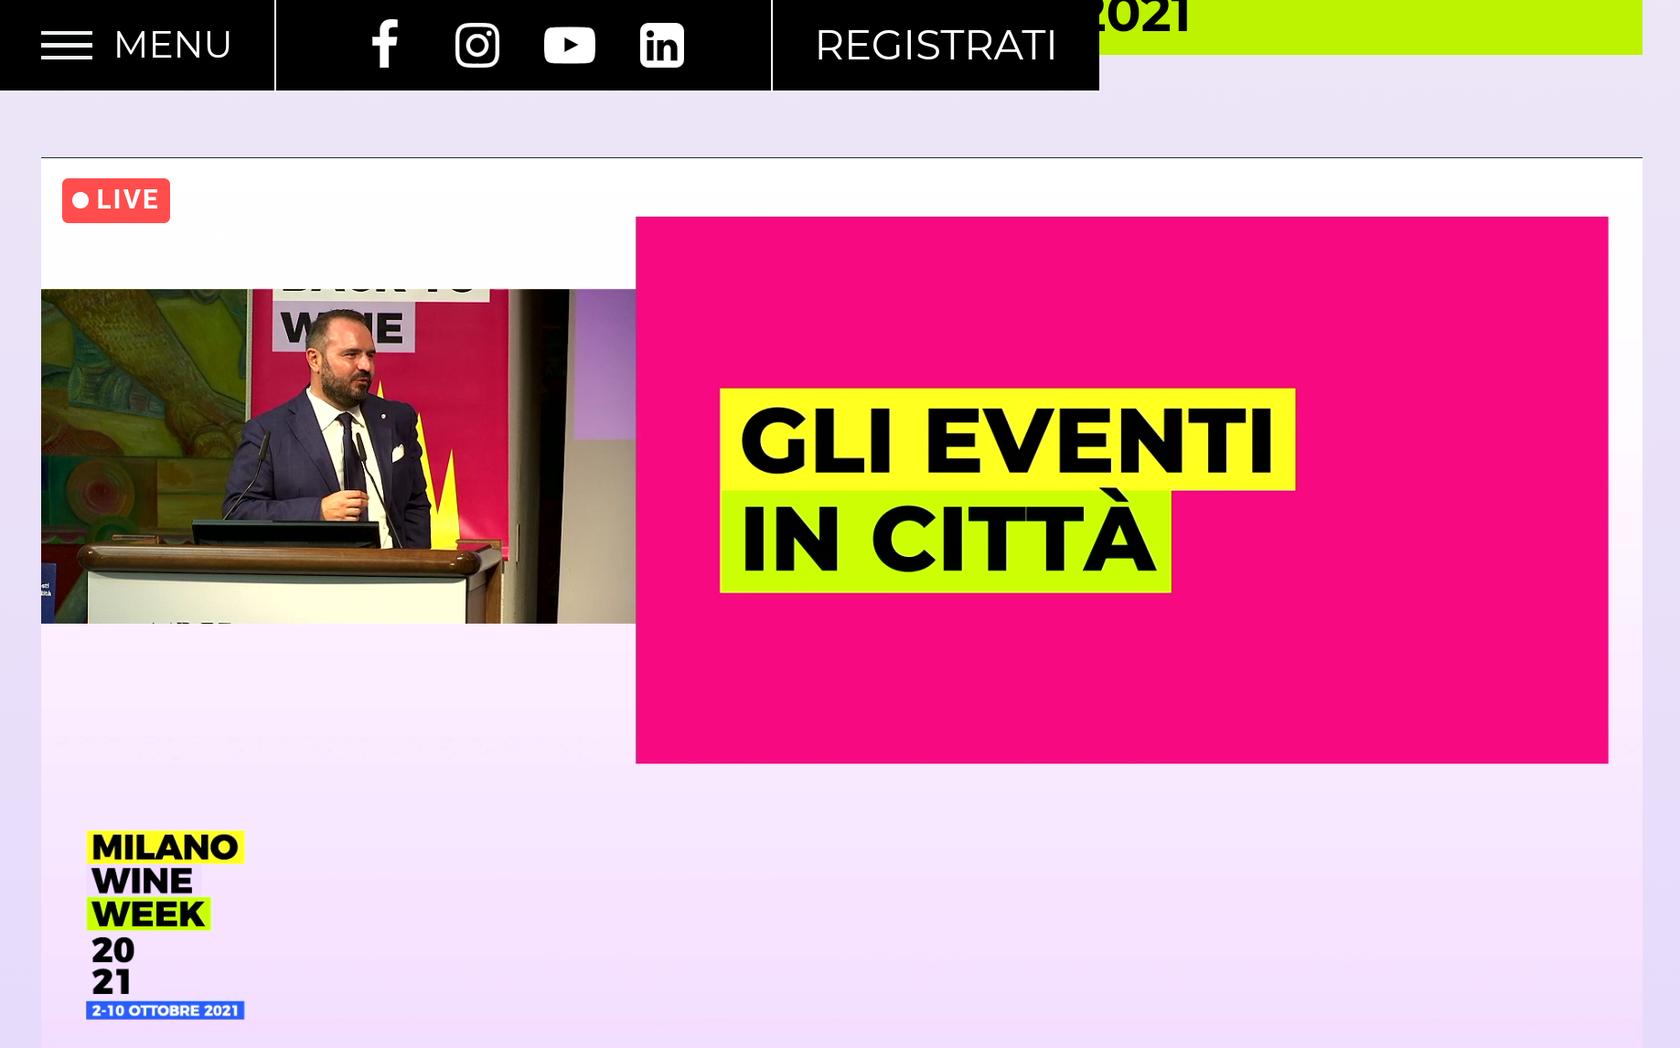 Gli eventi in città Milano Wine Week 2021